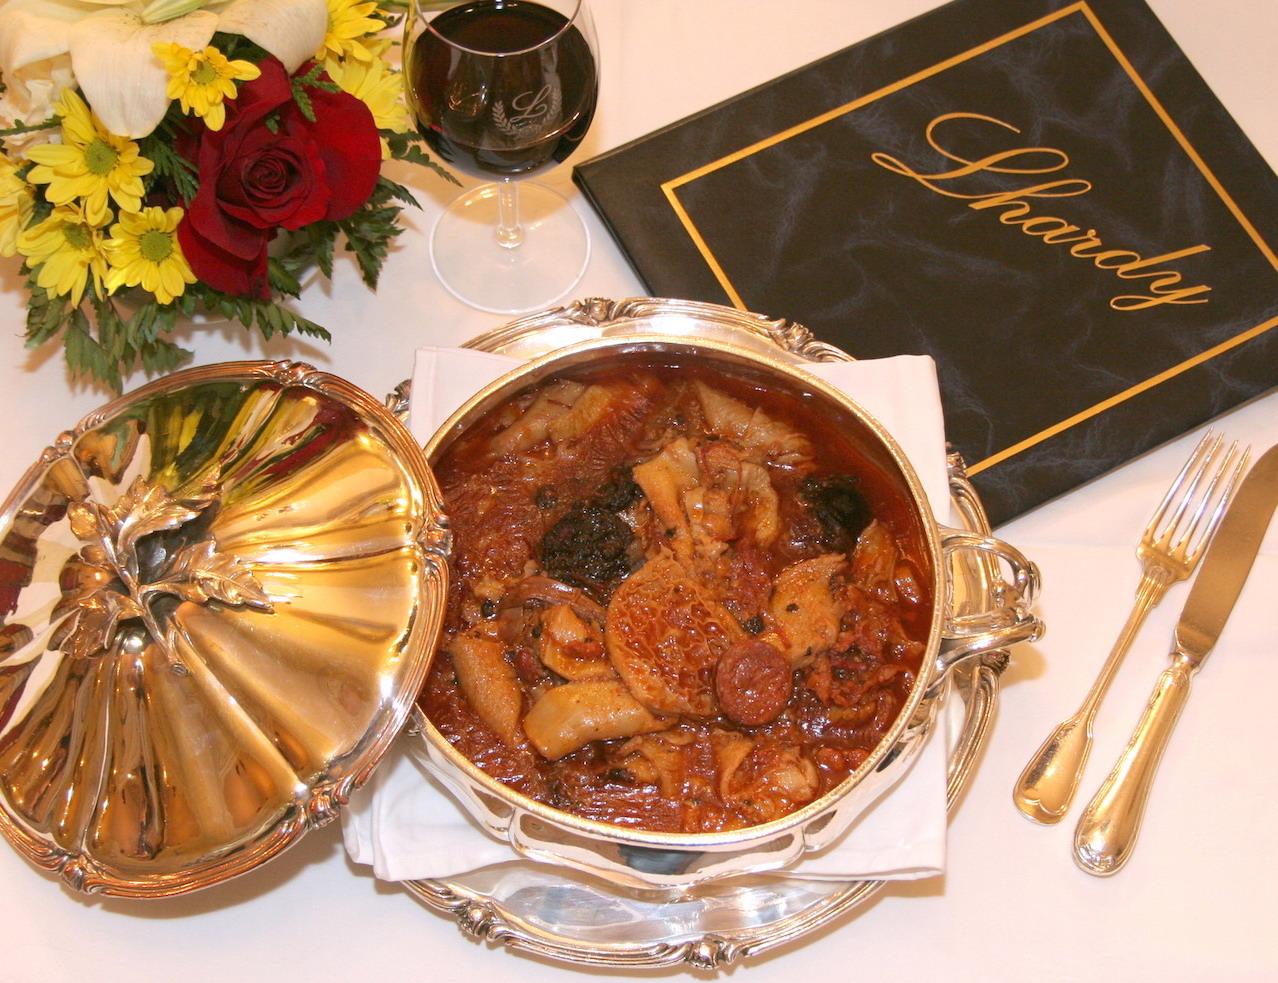 Lhardy, restaurante, gastronomia, foodies, historia, madrid, lifestyle, turismo, callos